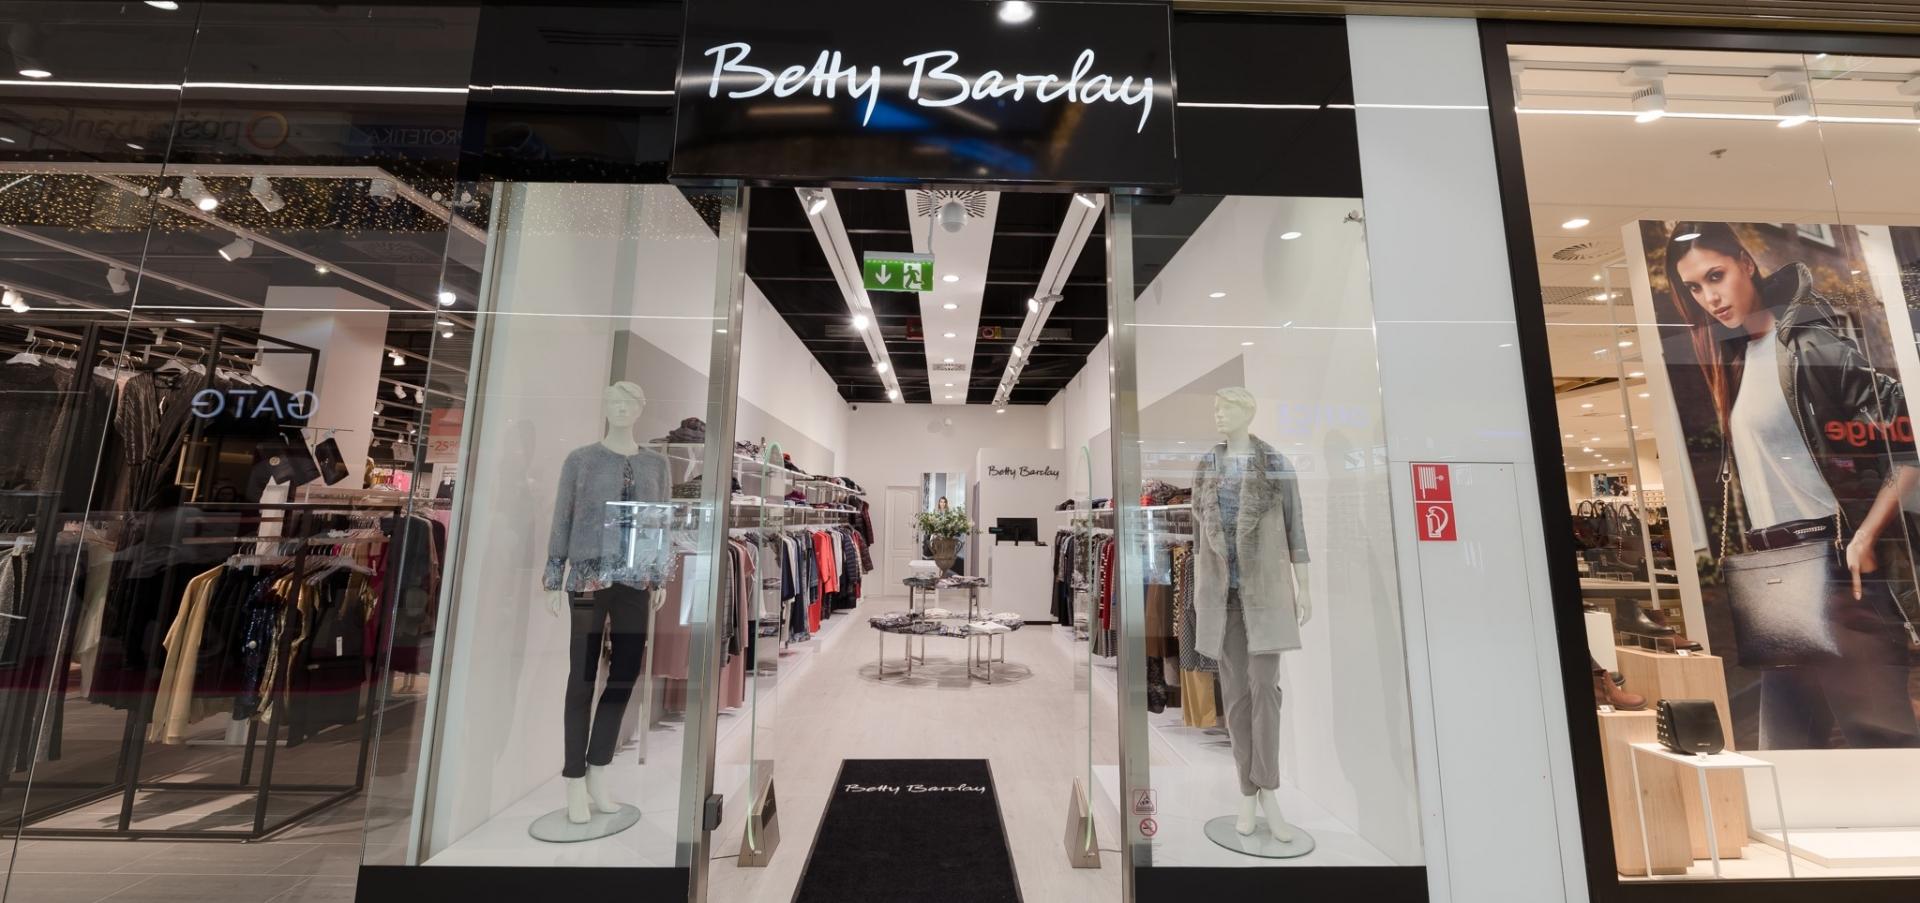 reputable site a433e 2fe91 Betty Barclay | Eperia - Shopping mall